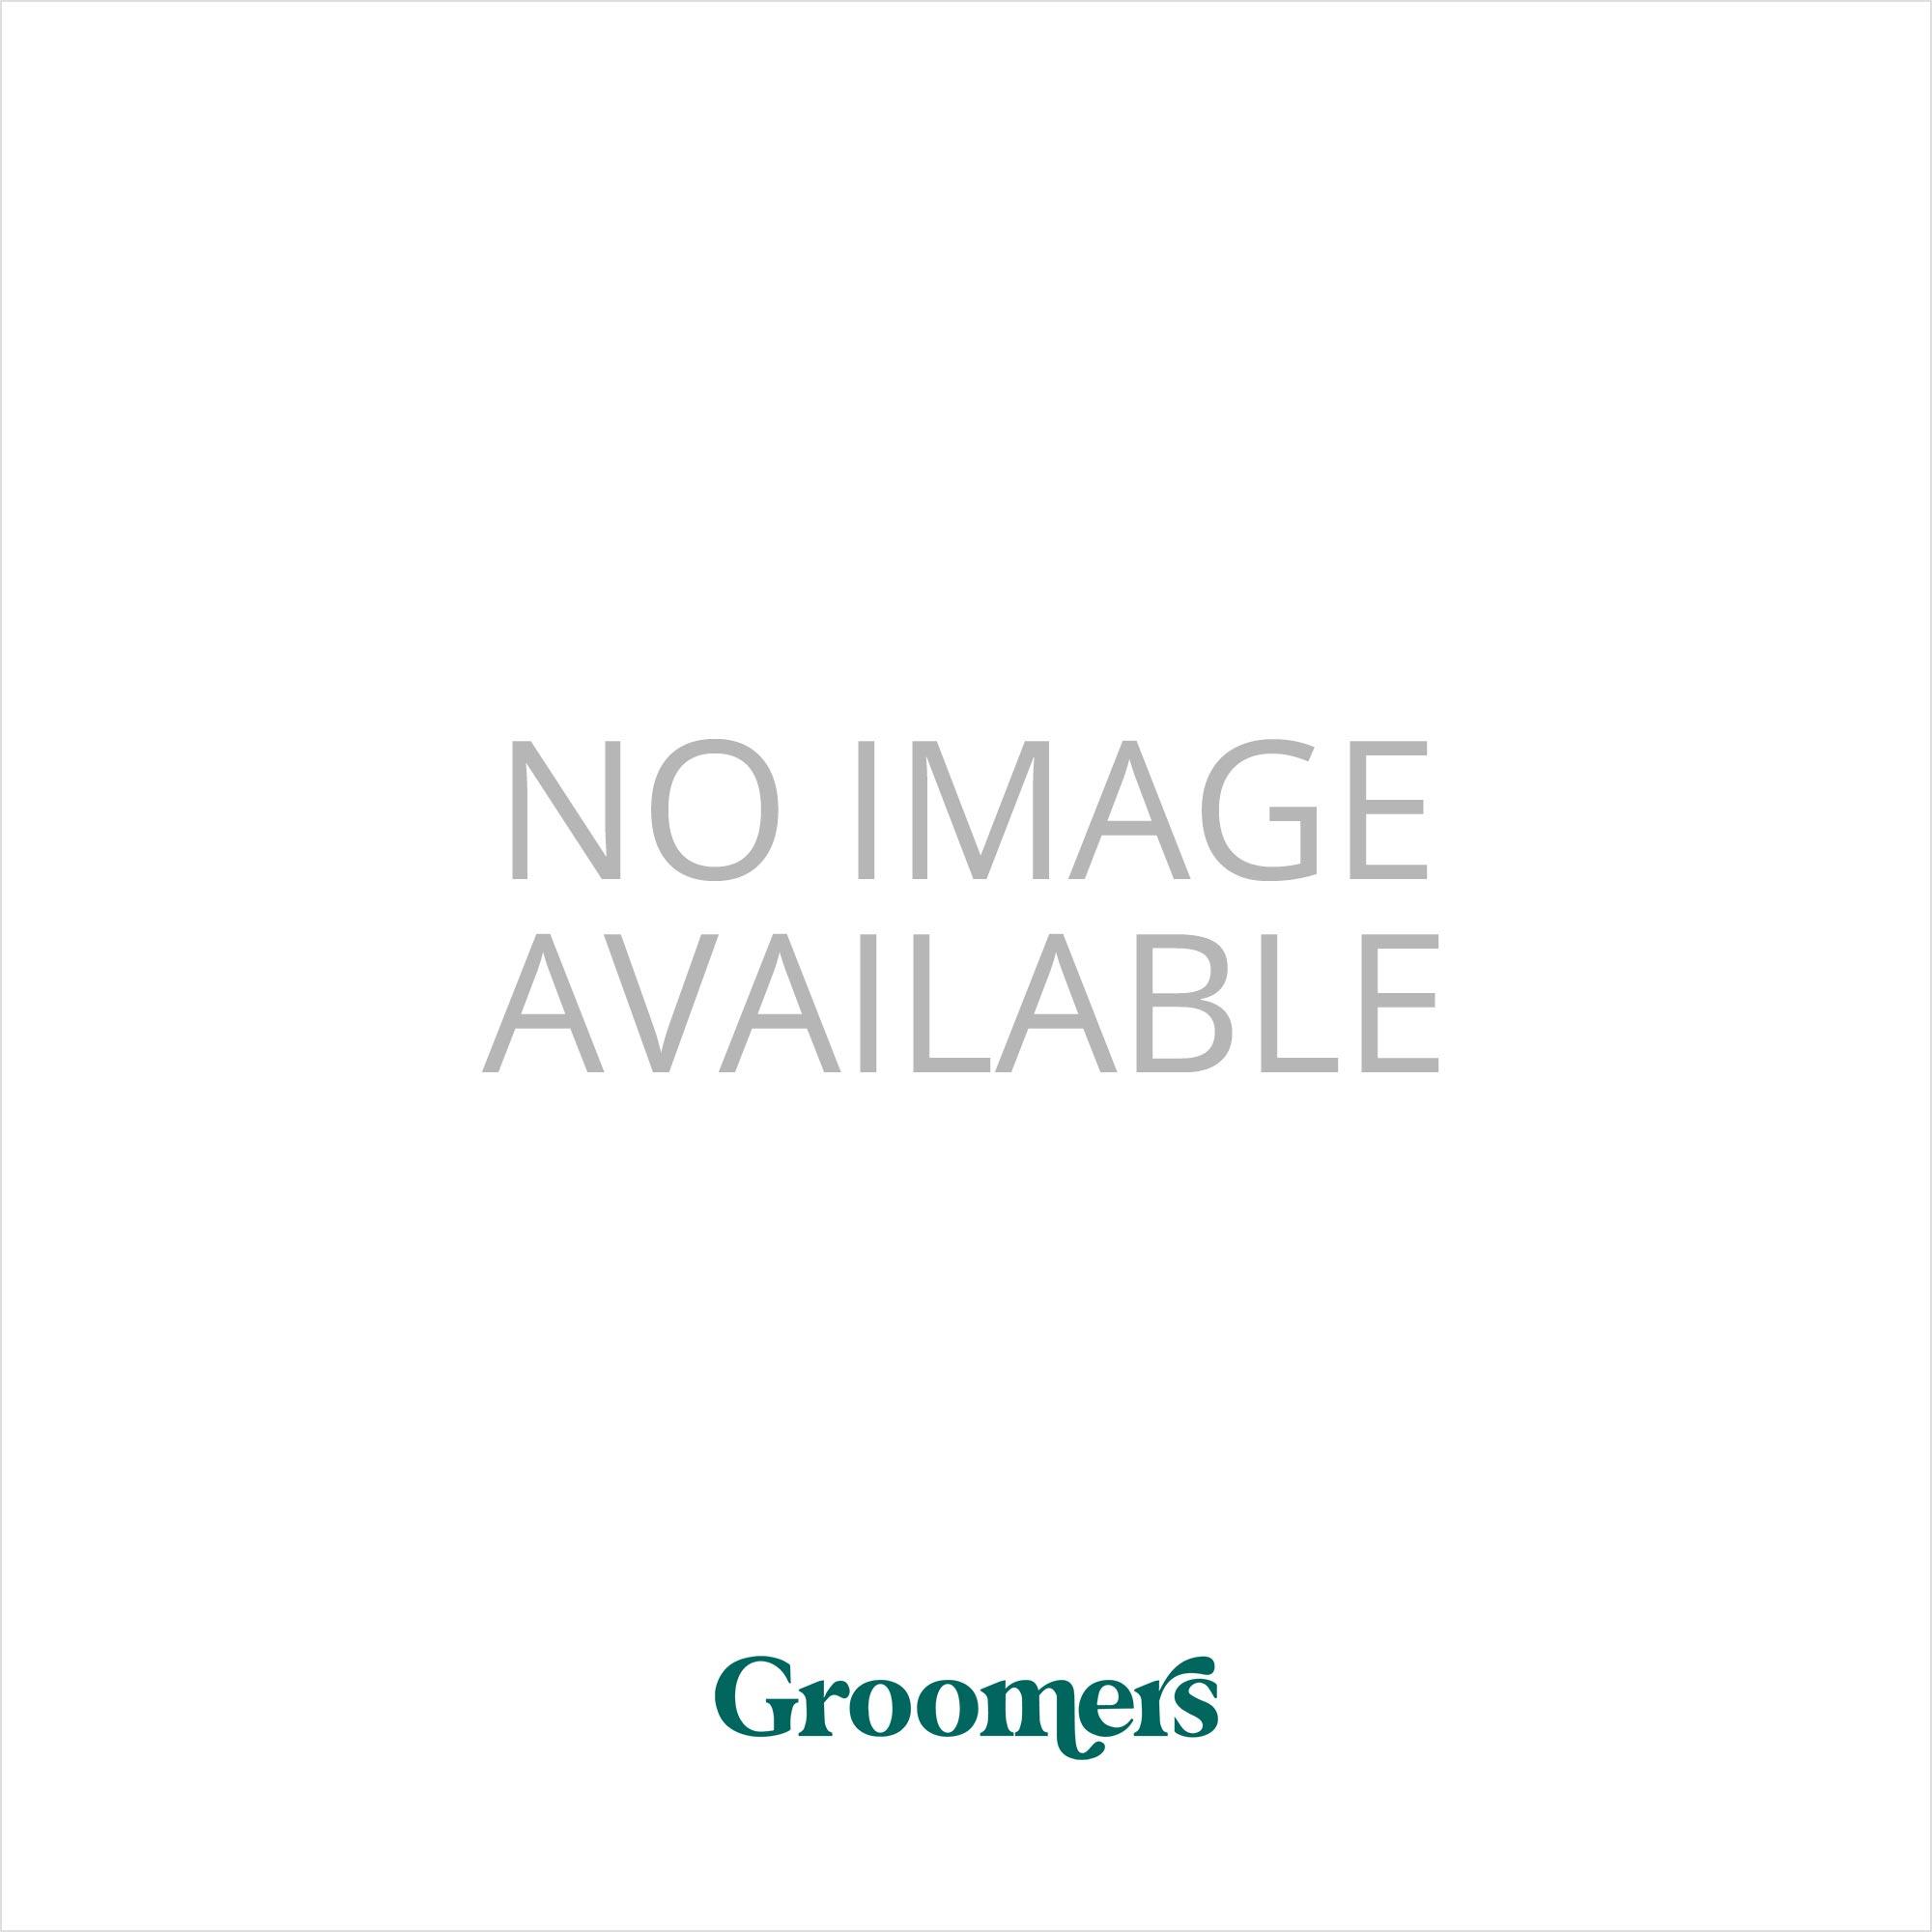 Groomers Aromatherapy Spray - Retail Size (250ml)